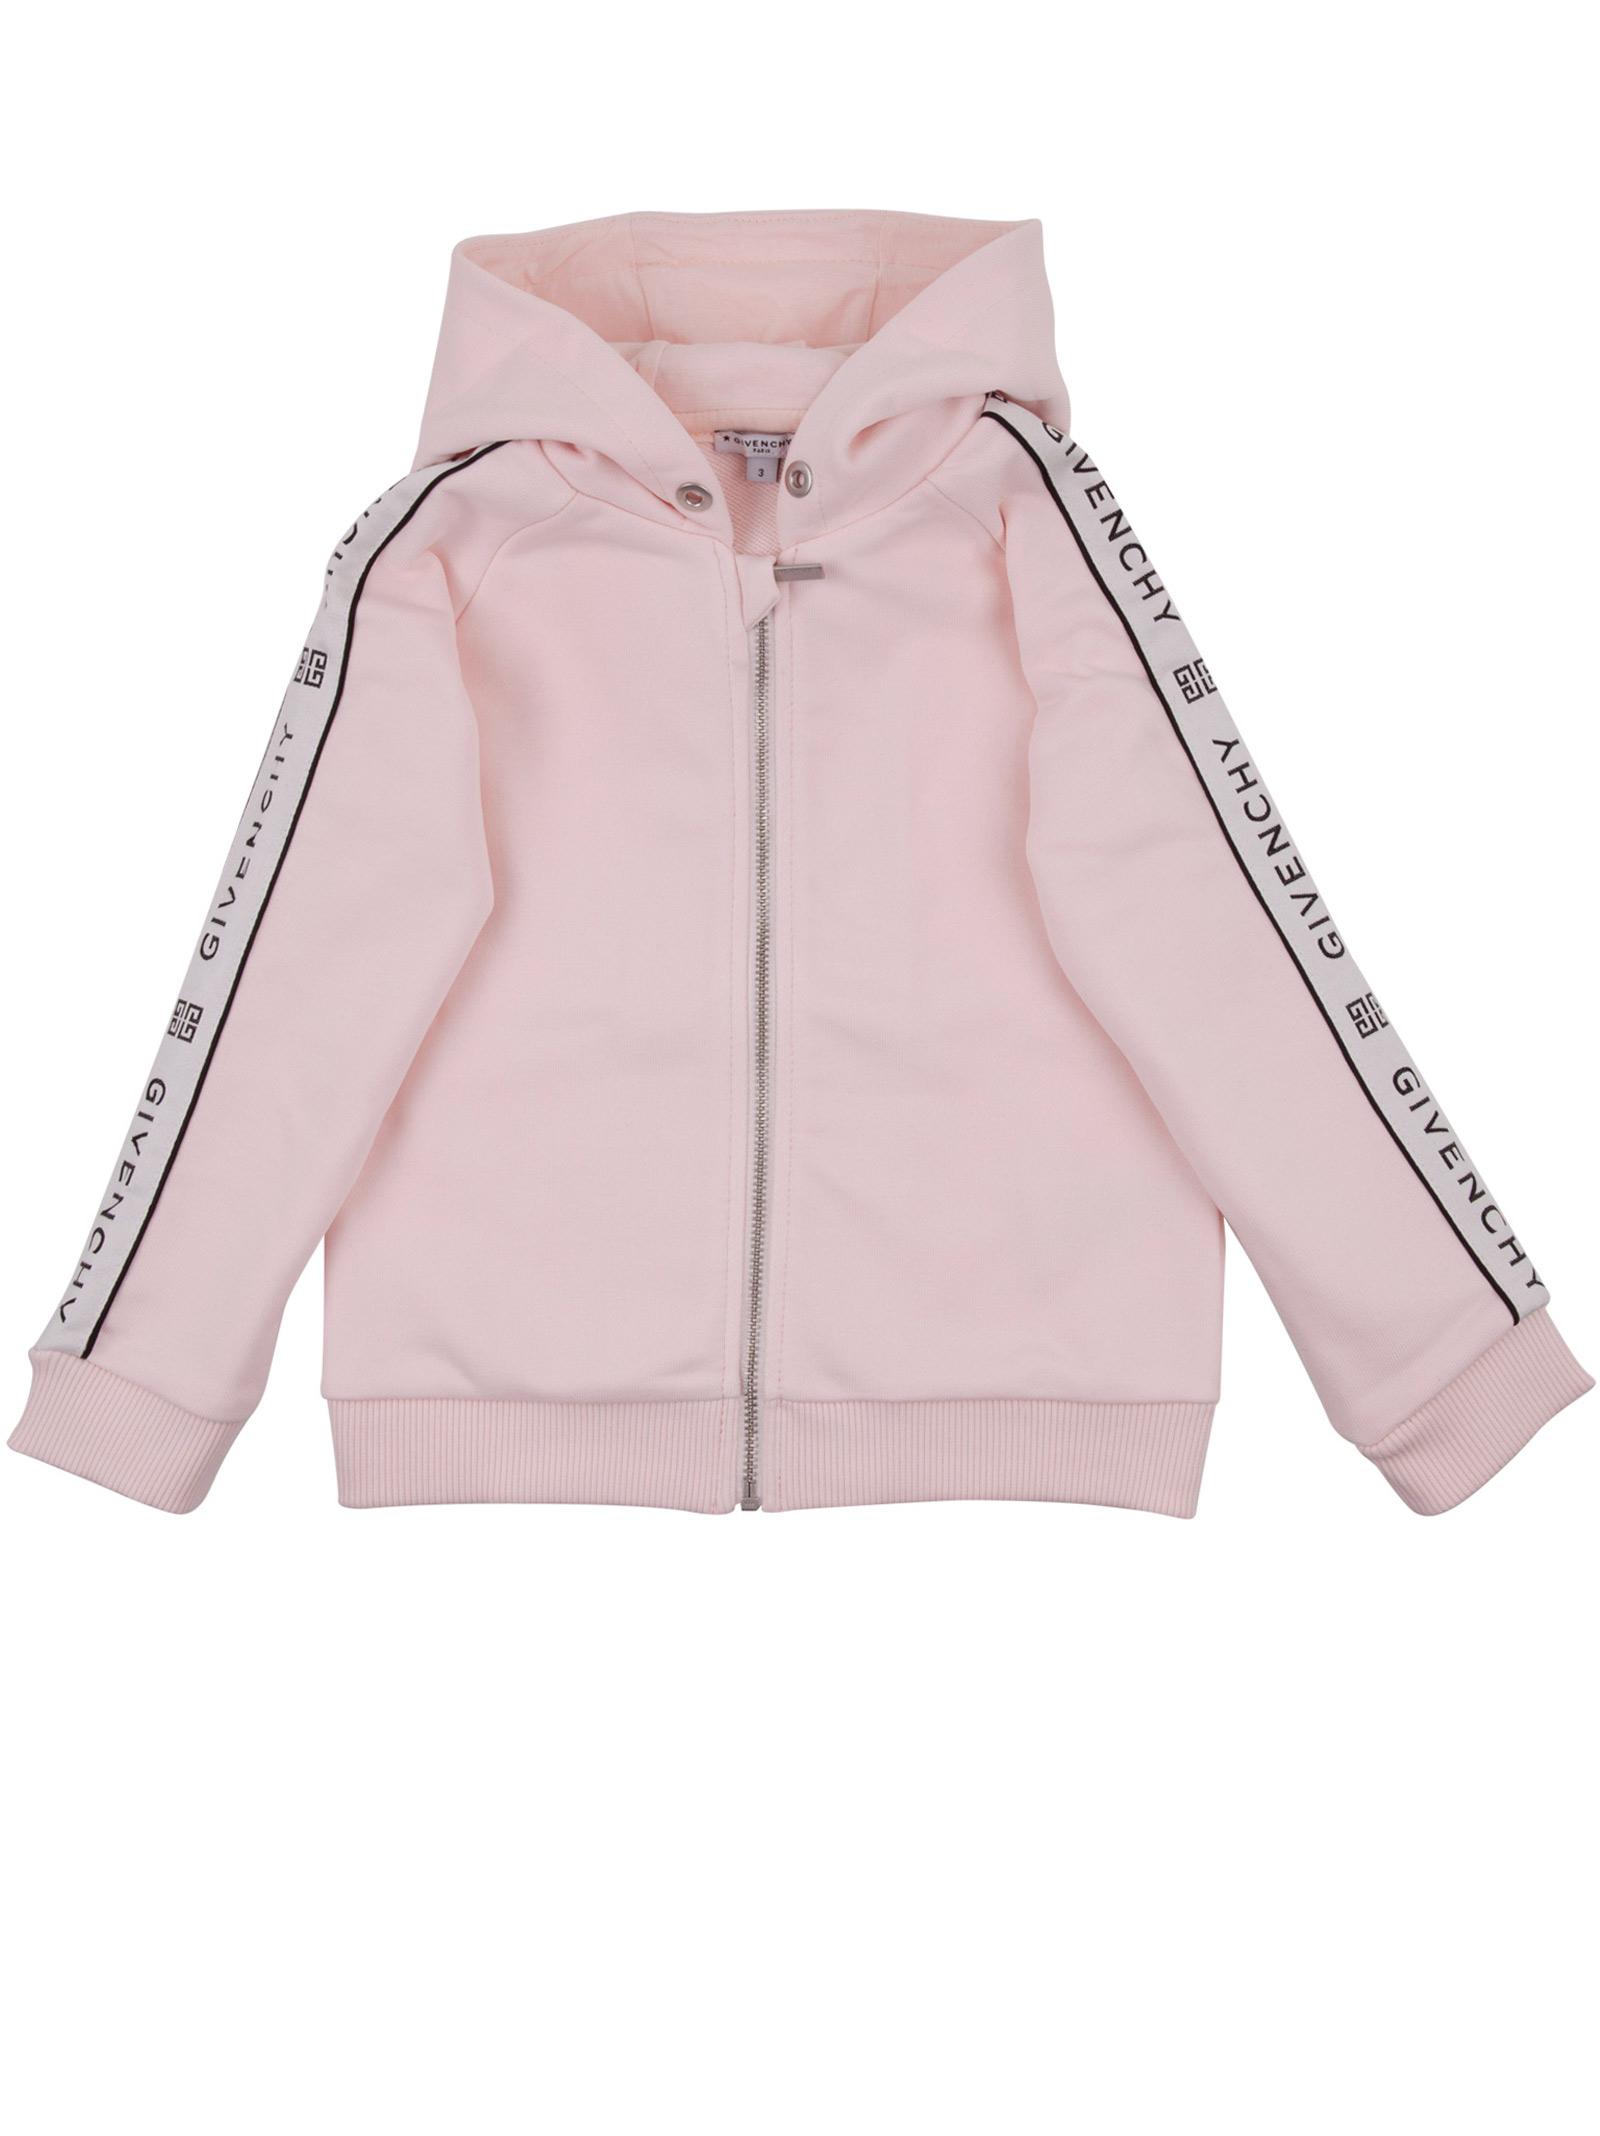 81222e5b1 Givenchy kids track suit - GIVENCHY kids - Michele Franzese Moda